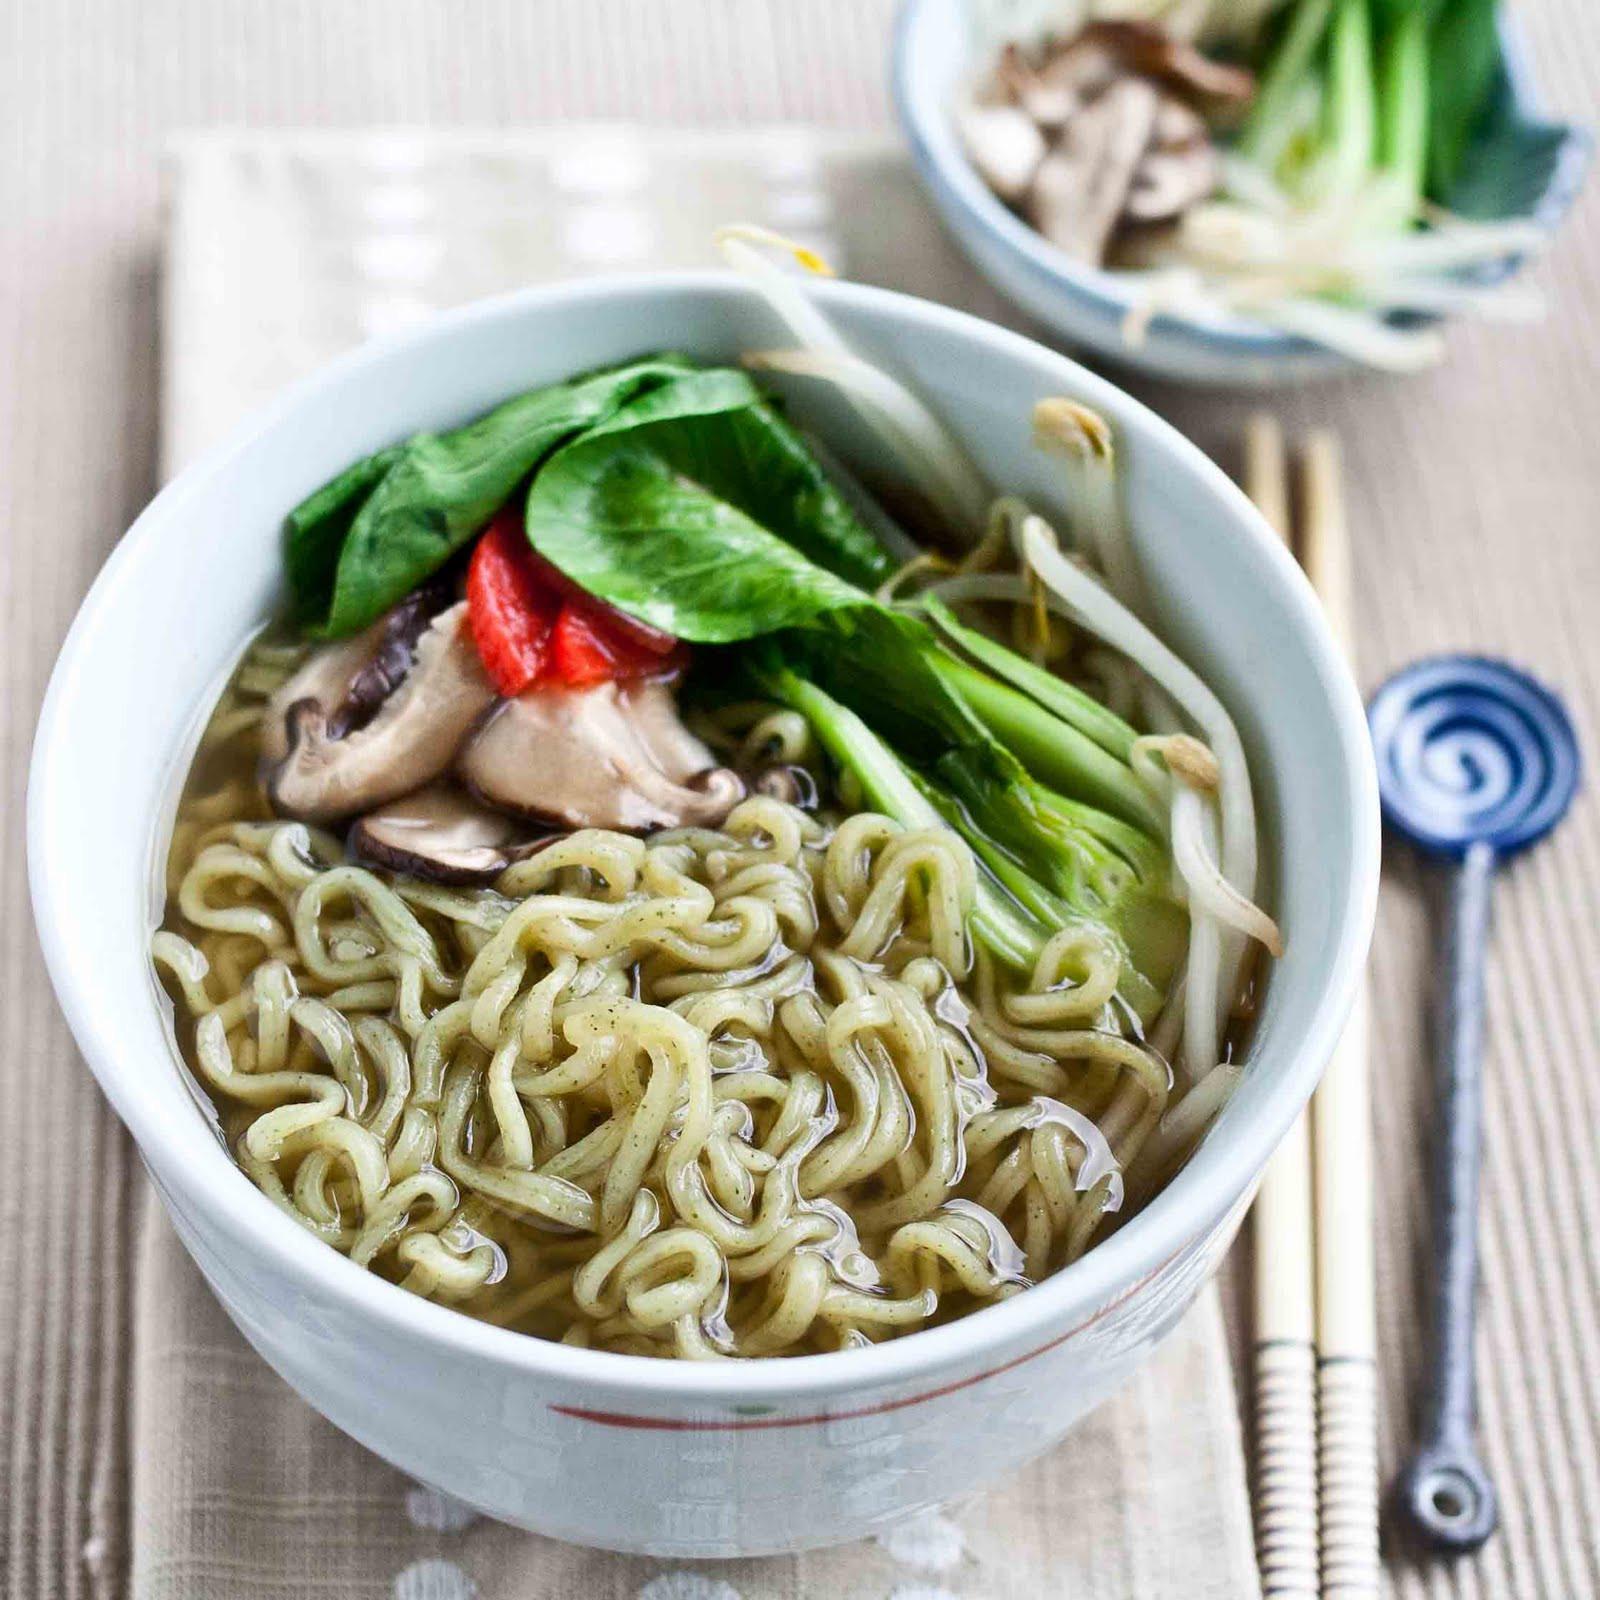 Healthy Ramen Noodles  FOODjimoto GreeNoodle Healthier Instant Ramen